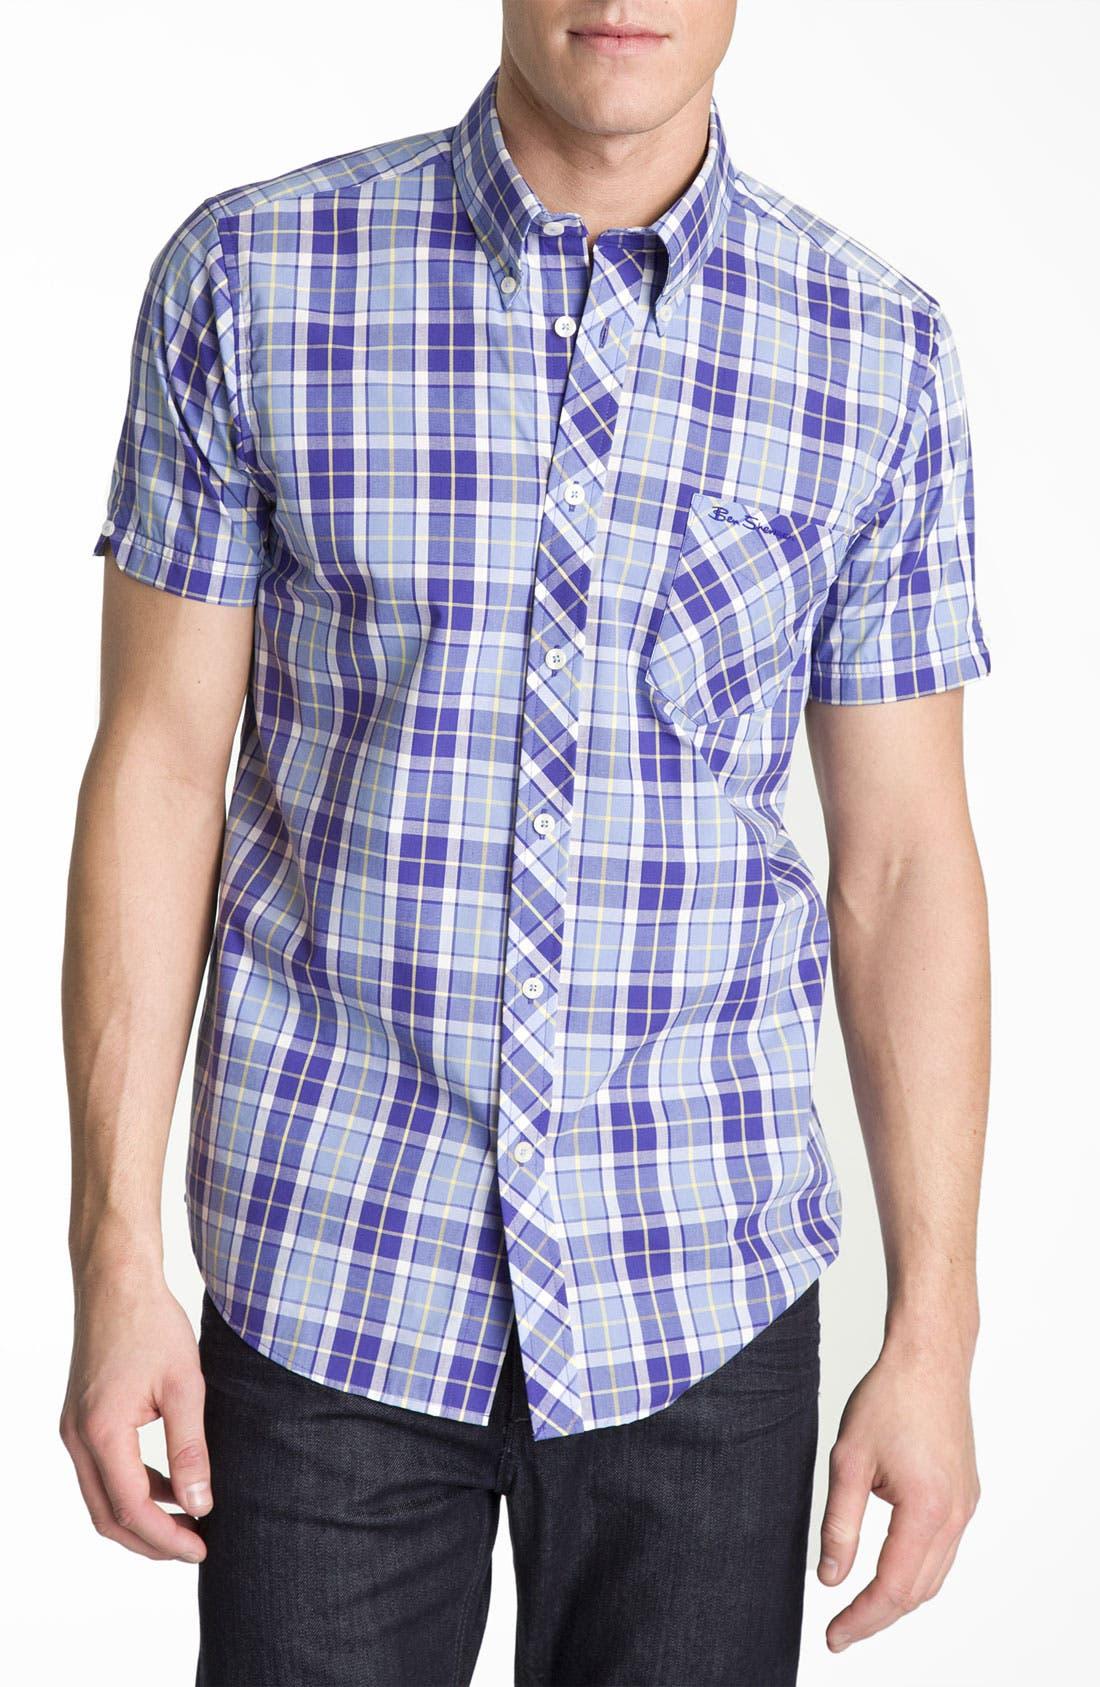 Main Image - Ben Sherman 'Covent' Plaid Woven Shirt